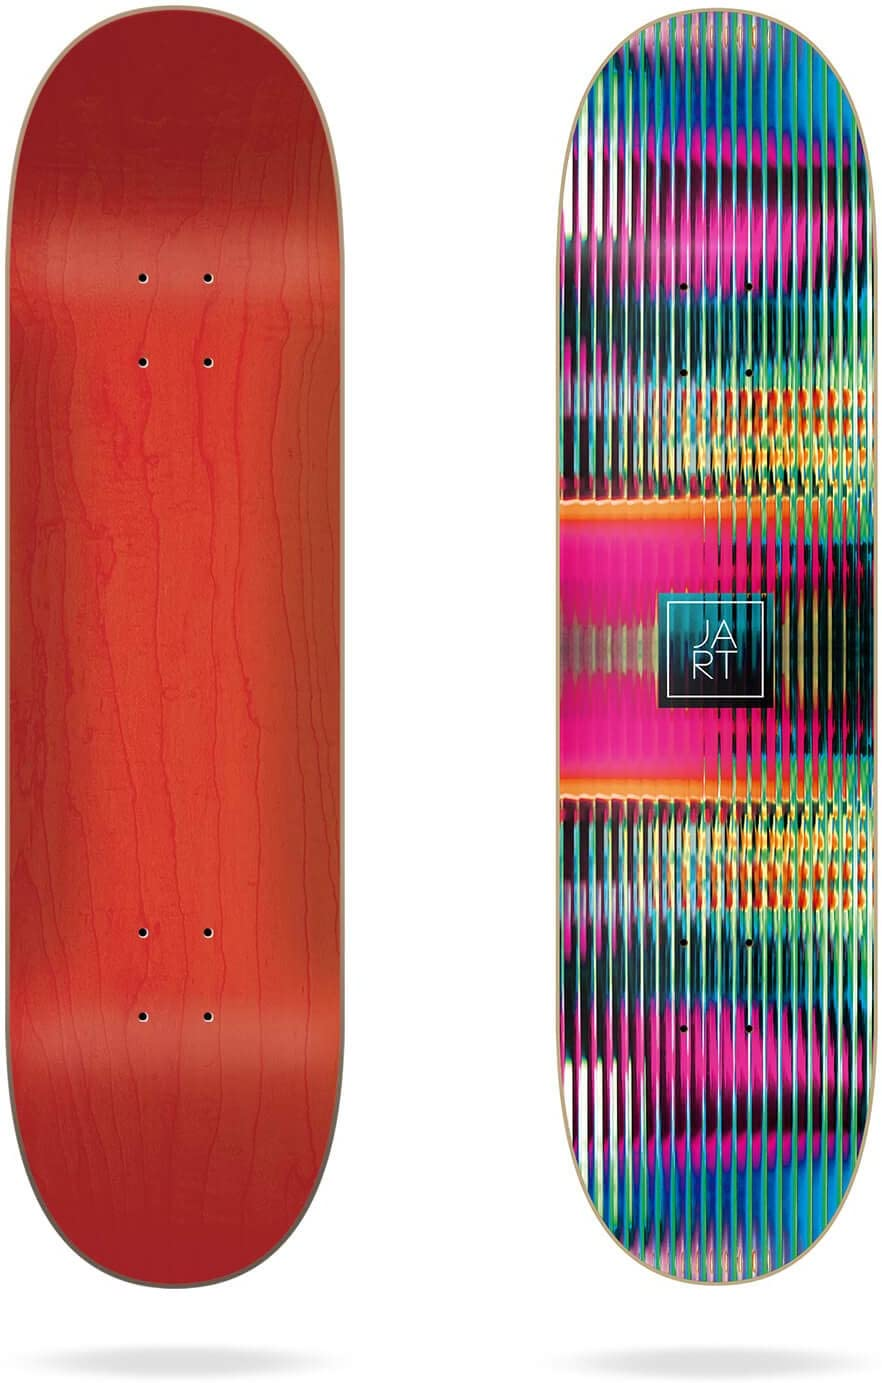 ENUFF Classic Fade Deck Planche de Skate Mixte Adulte Mixte Adulte